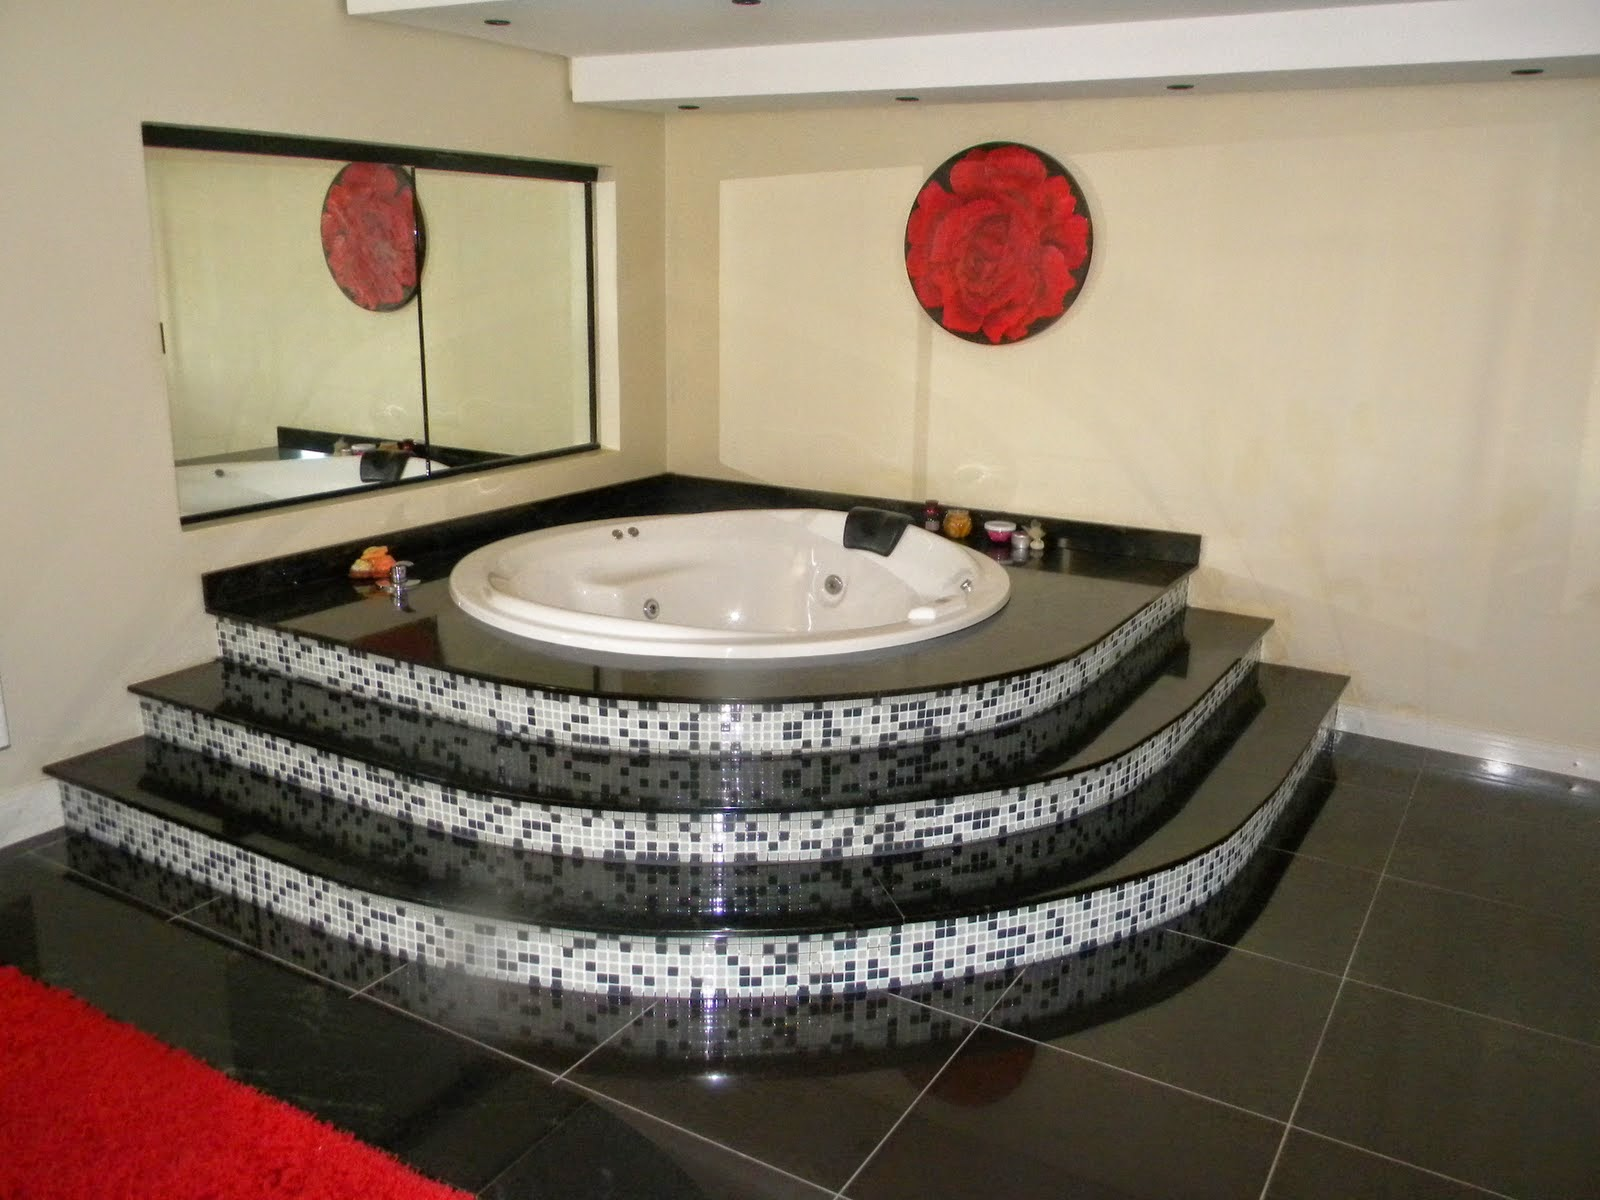 decorar um banheiro : decorar um banheiro:Como decorar um banheiro com piso de granito preto